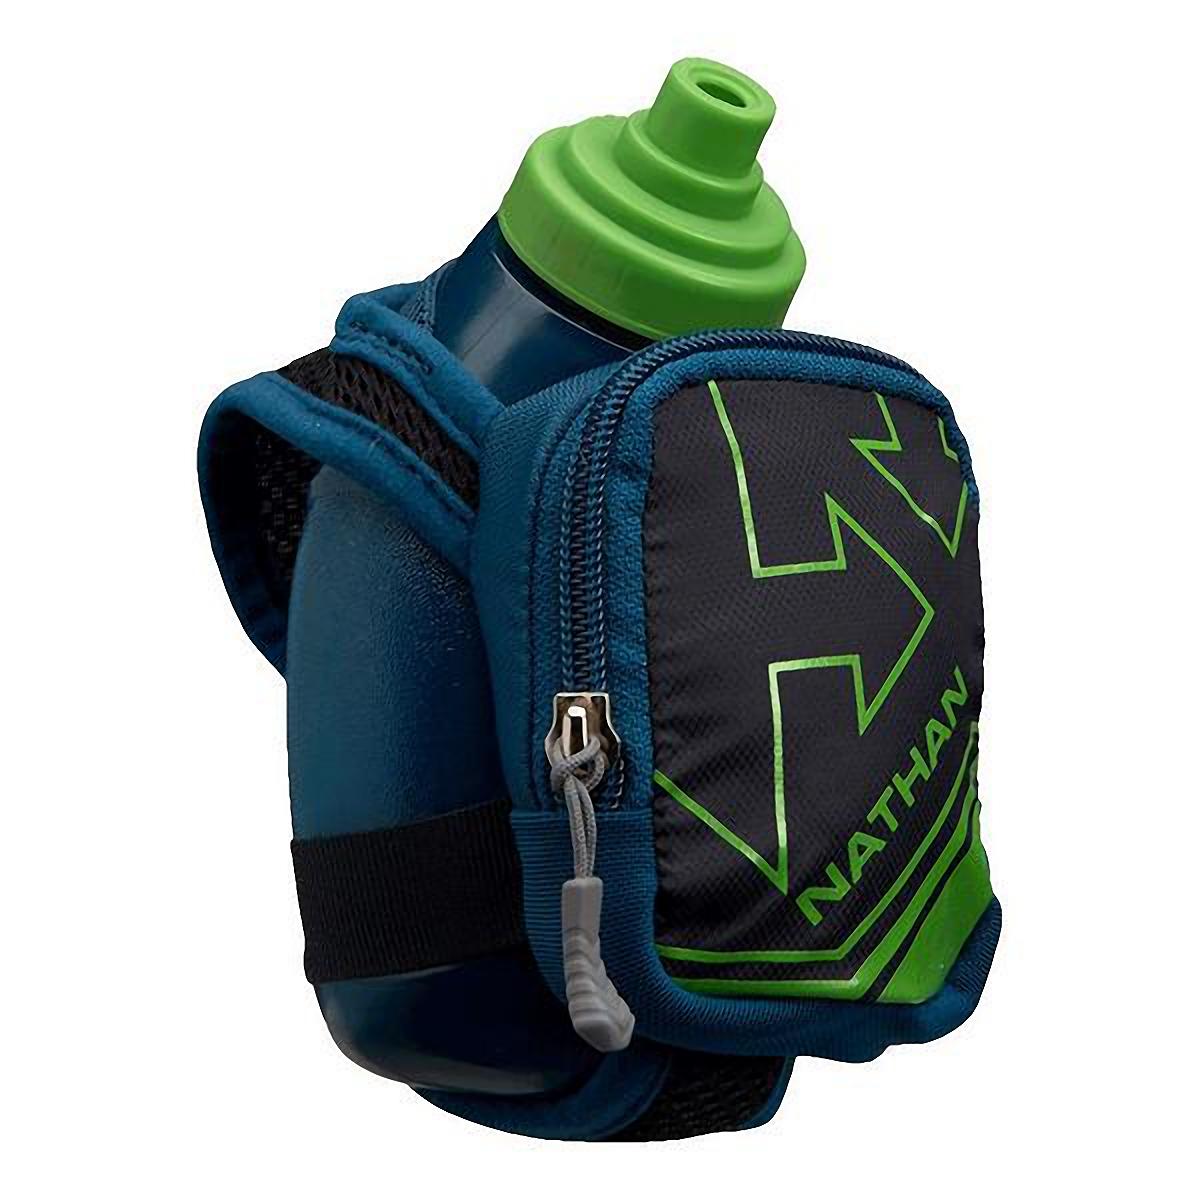 Nathan Quickshot Plus Hydration Flask - Color: Black/Classic Green - Size: One Size, Black/Classic Green, large, image 1